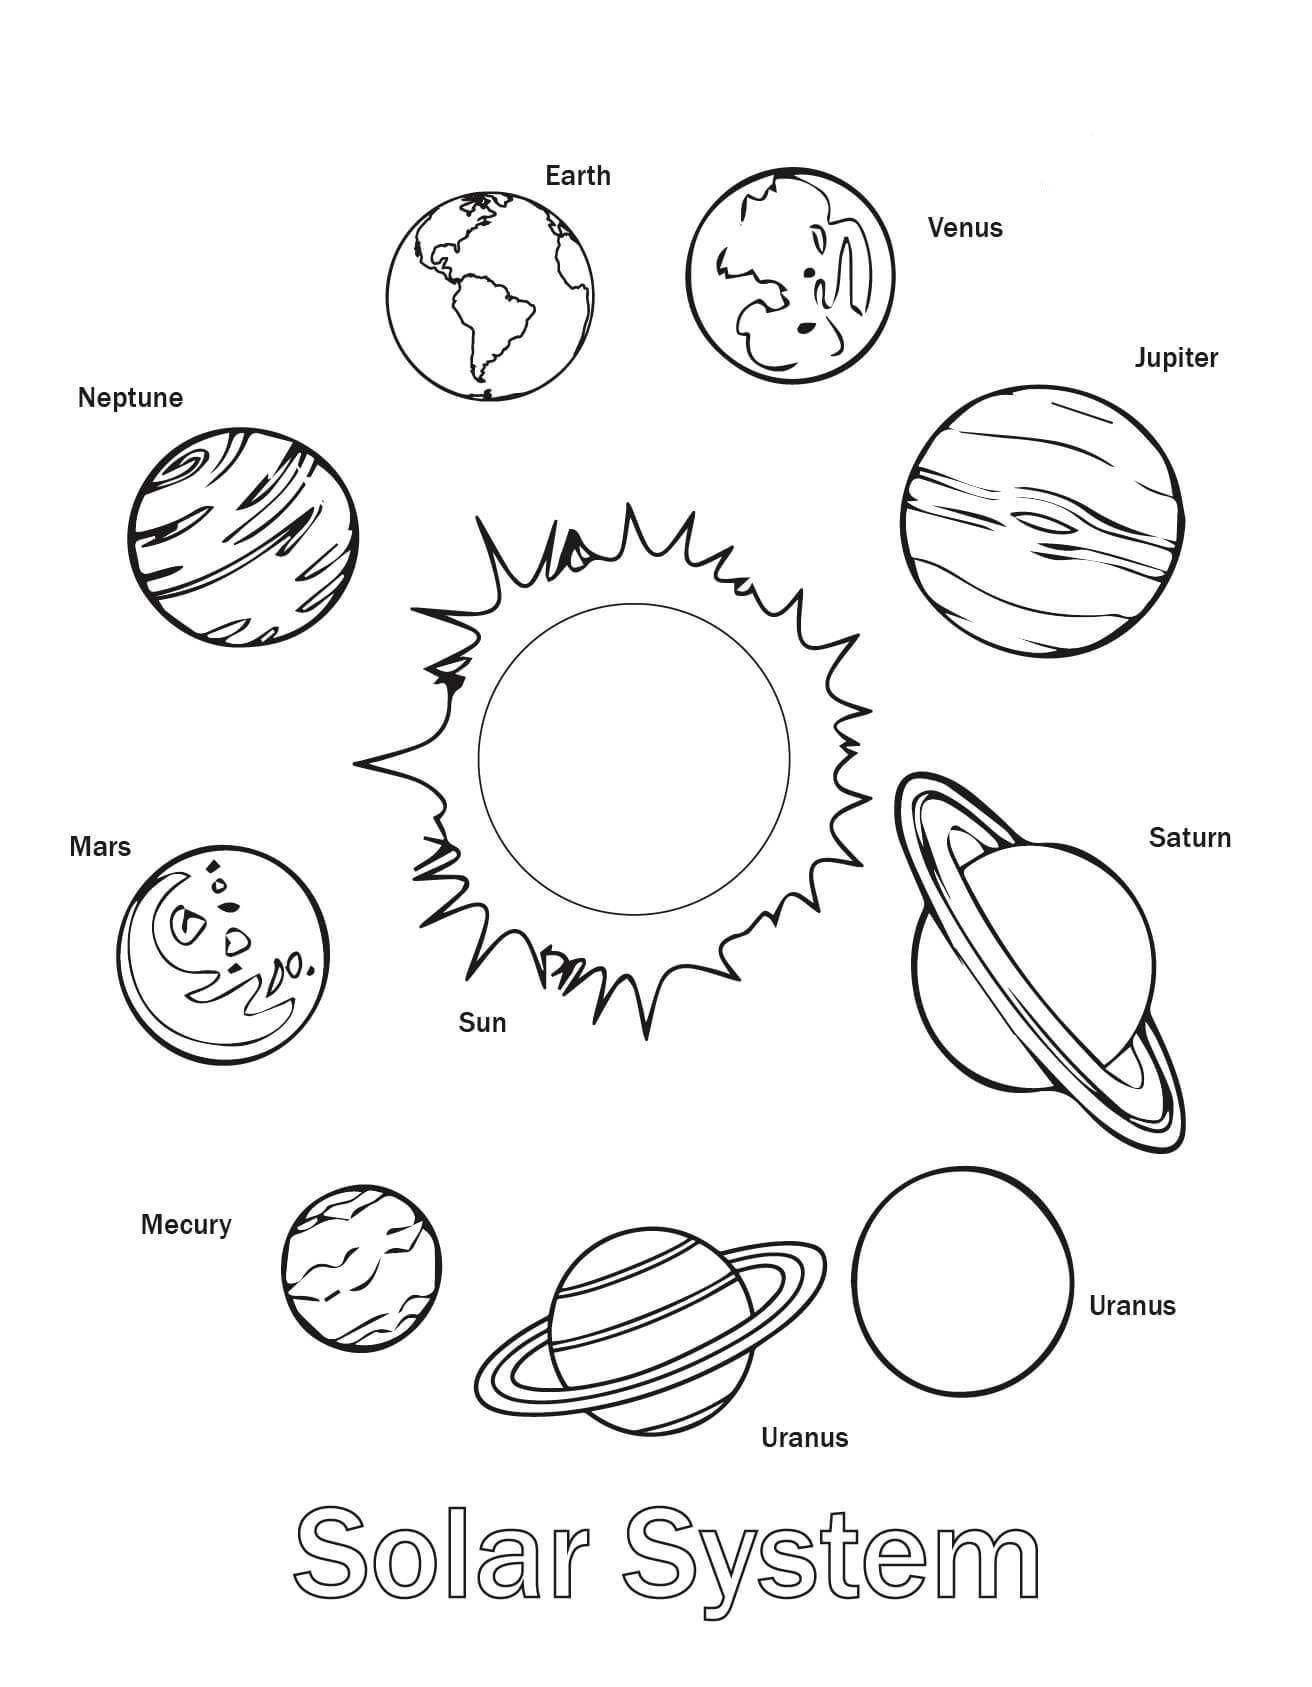 Free Kindergarten social Studies Worksheets Free Printable solar System Coloring for Kids social Stu S